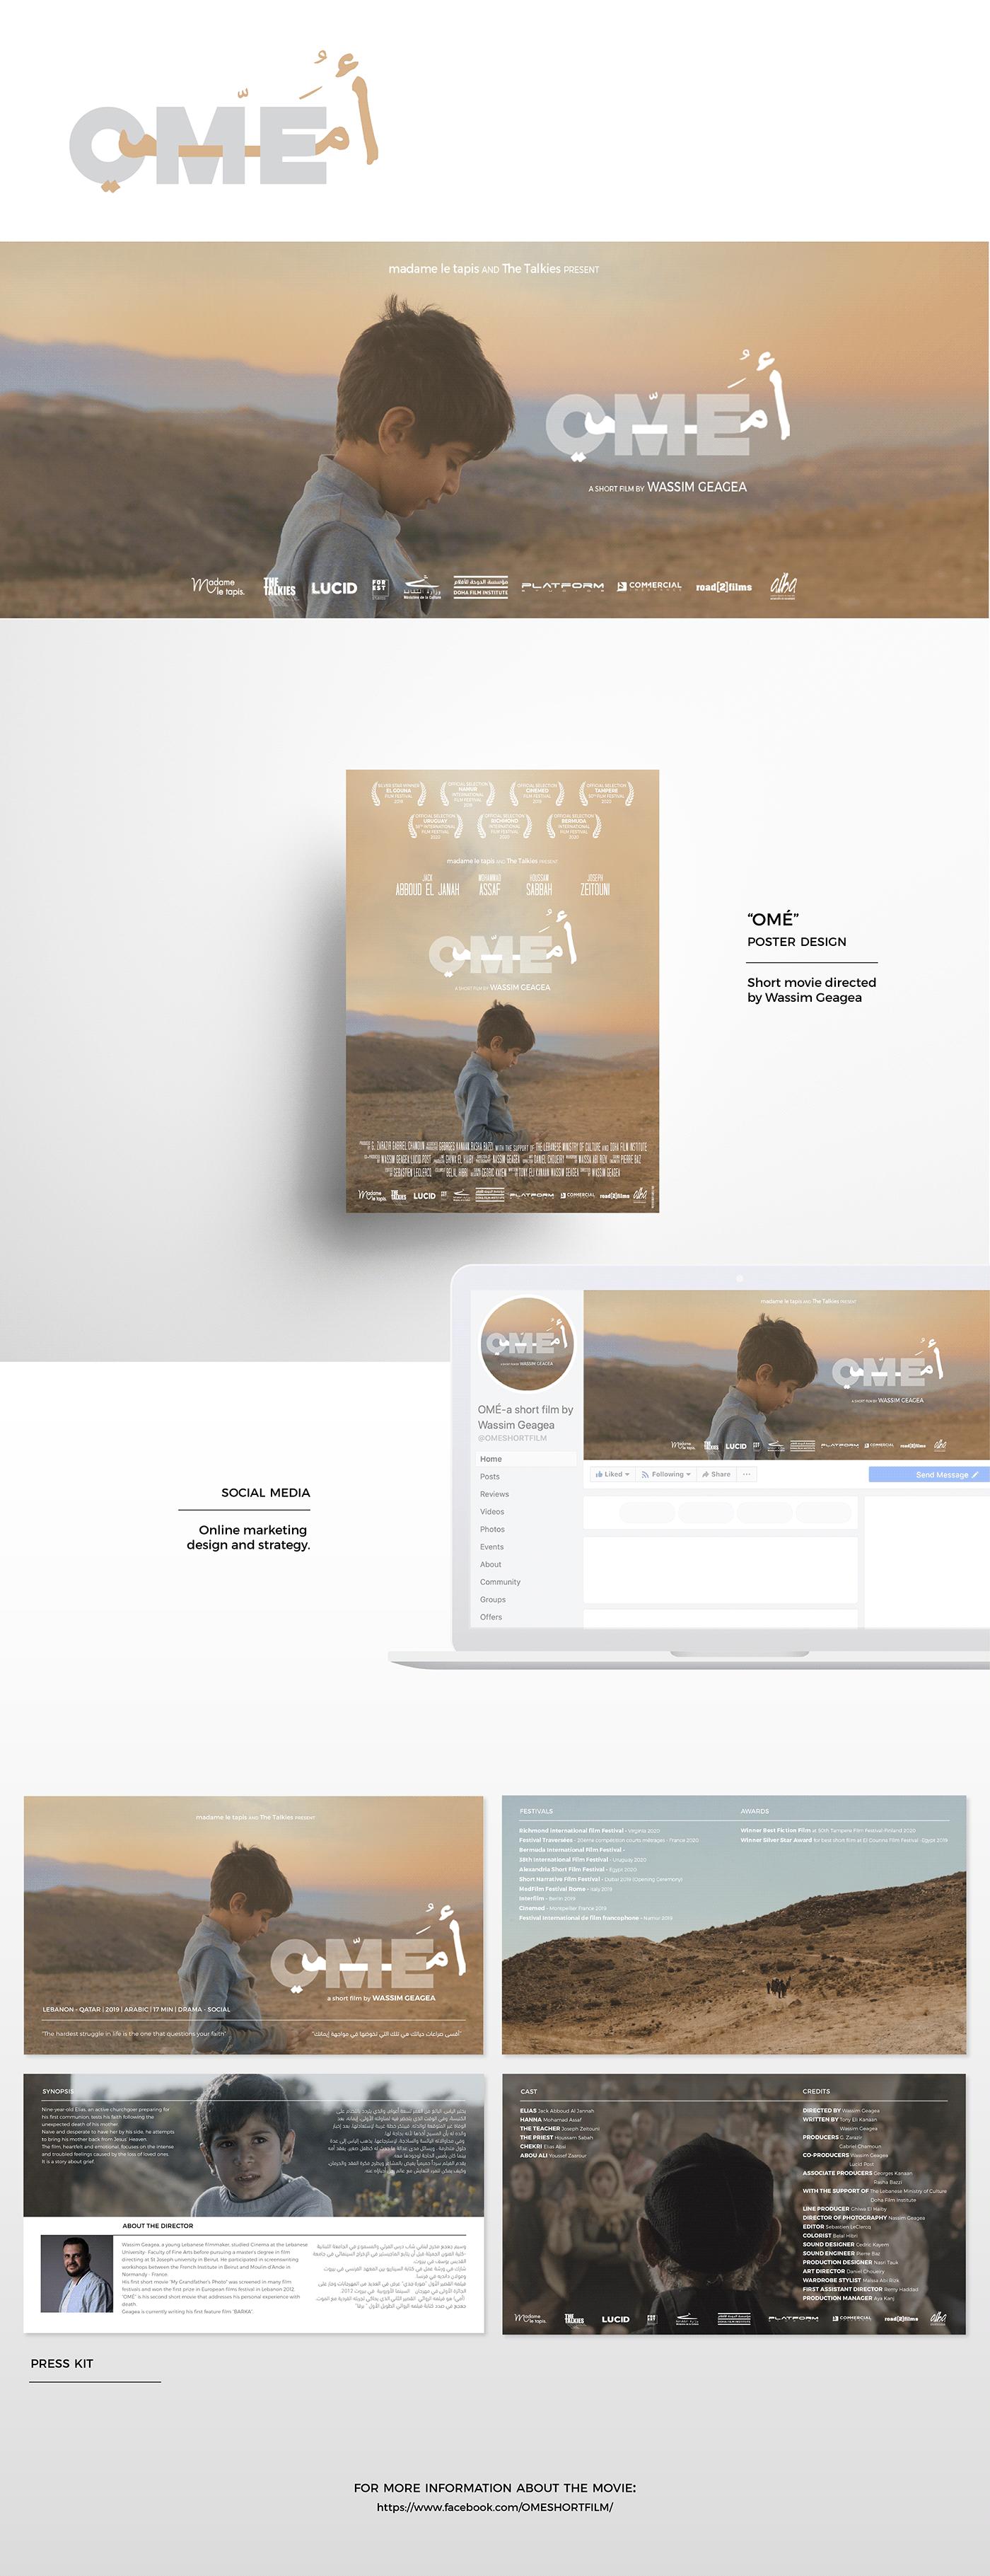 Advertising  cinematography graphic design  marketing   movie Poster Design social media